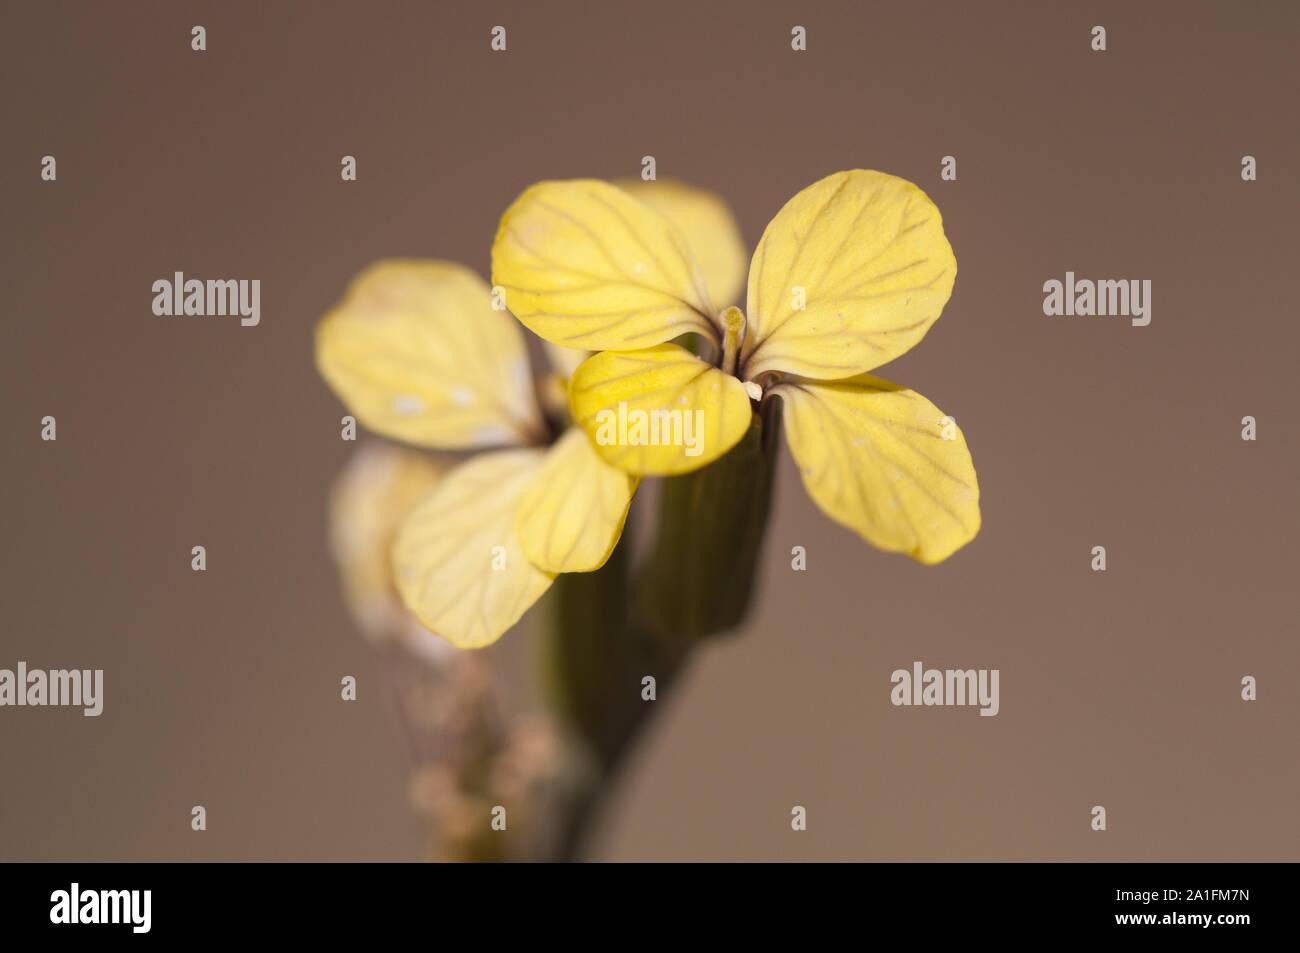 Fiori Gialli Con Quattro Petali.Quattro Petali Immagini Quattro Petali Fotos Stock Alamy